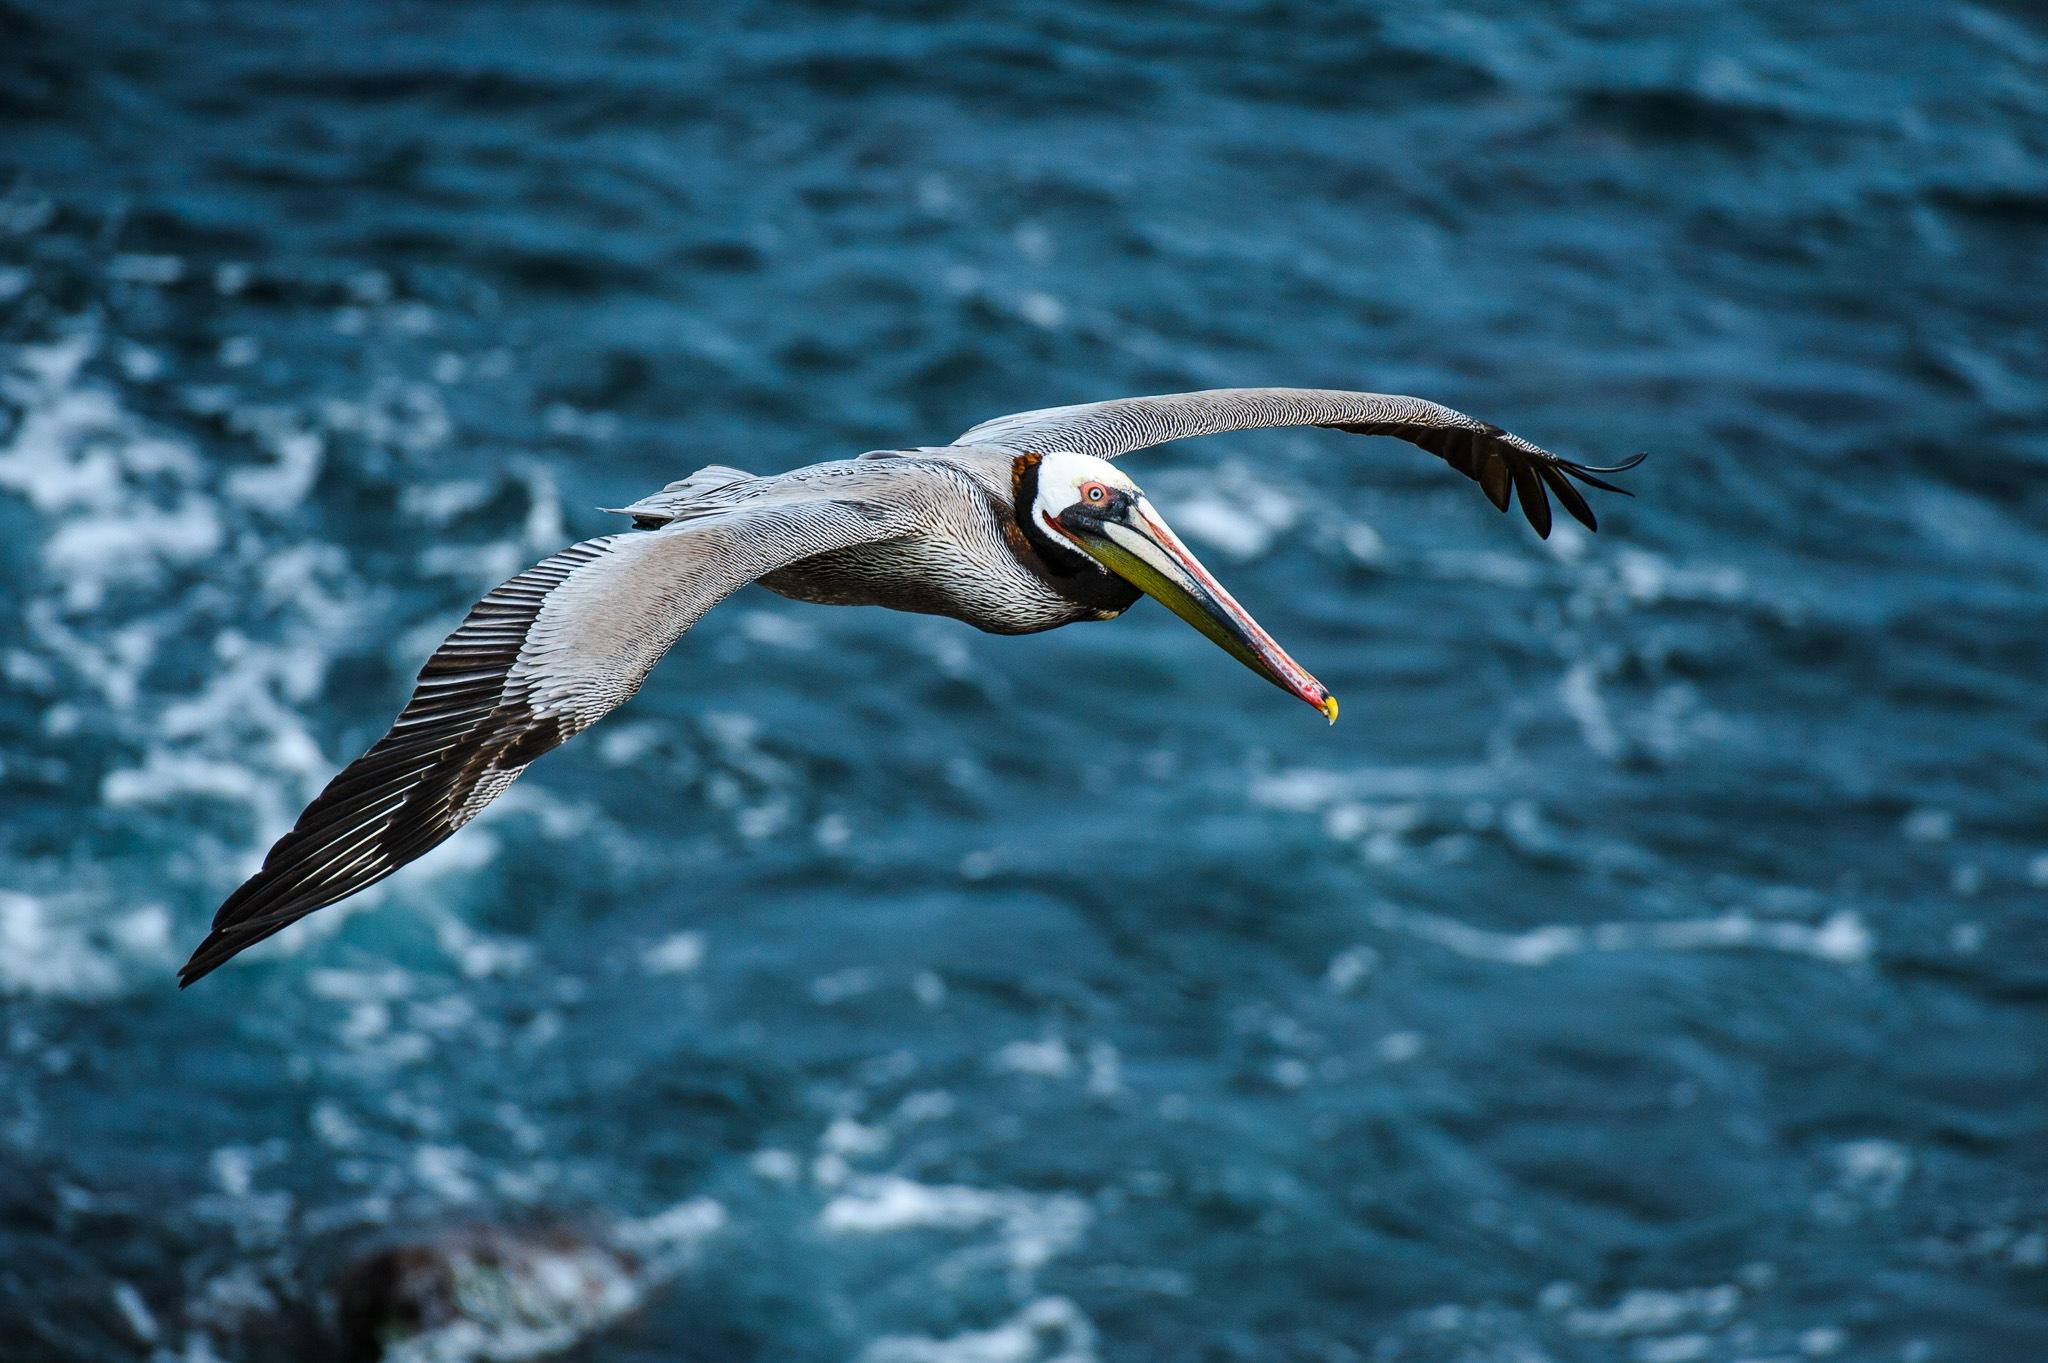 Brown Pelican by Karen Bekker